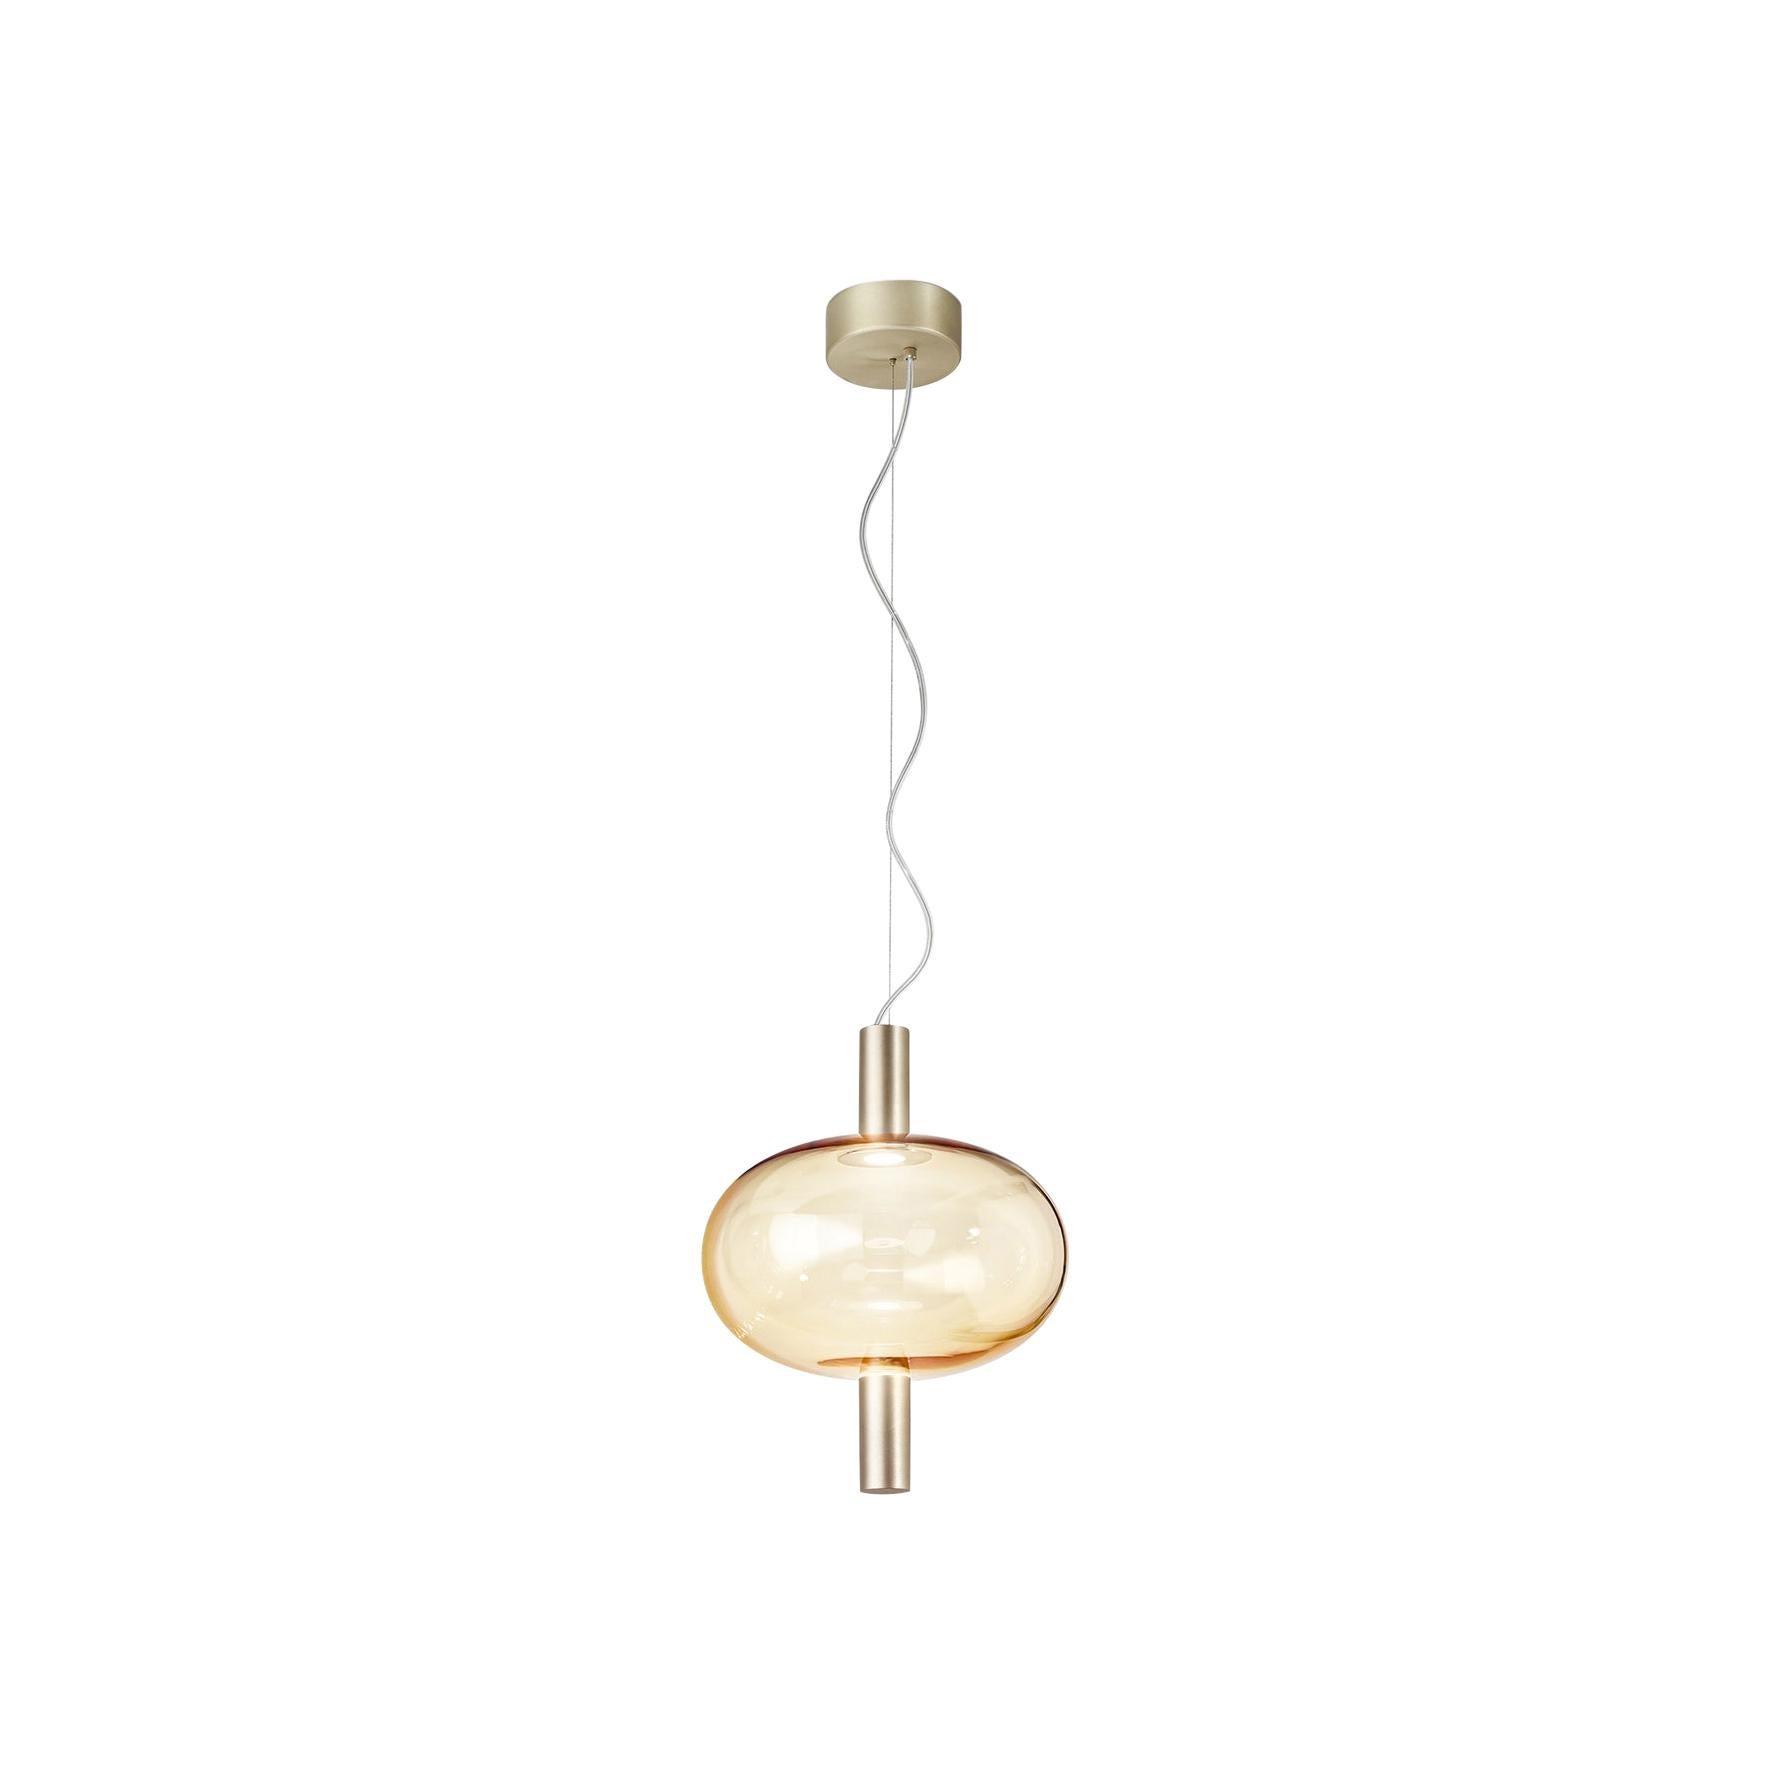 Vistosi LED Riflesso SP 1 Suspension Light by Chiaramonte